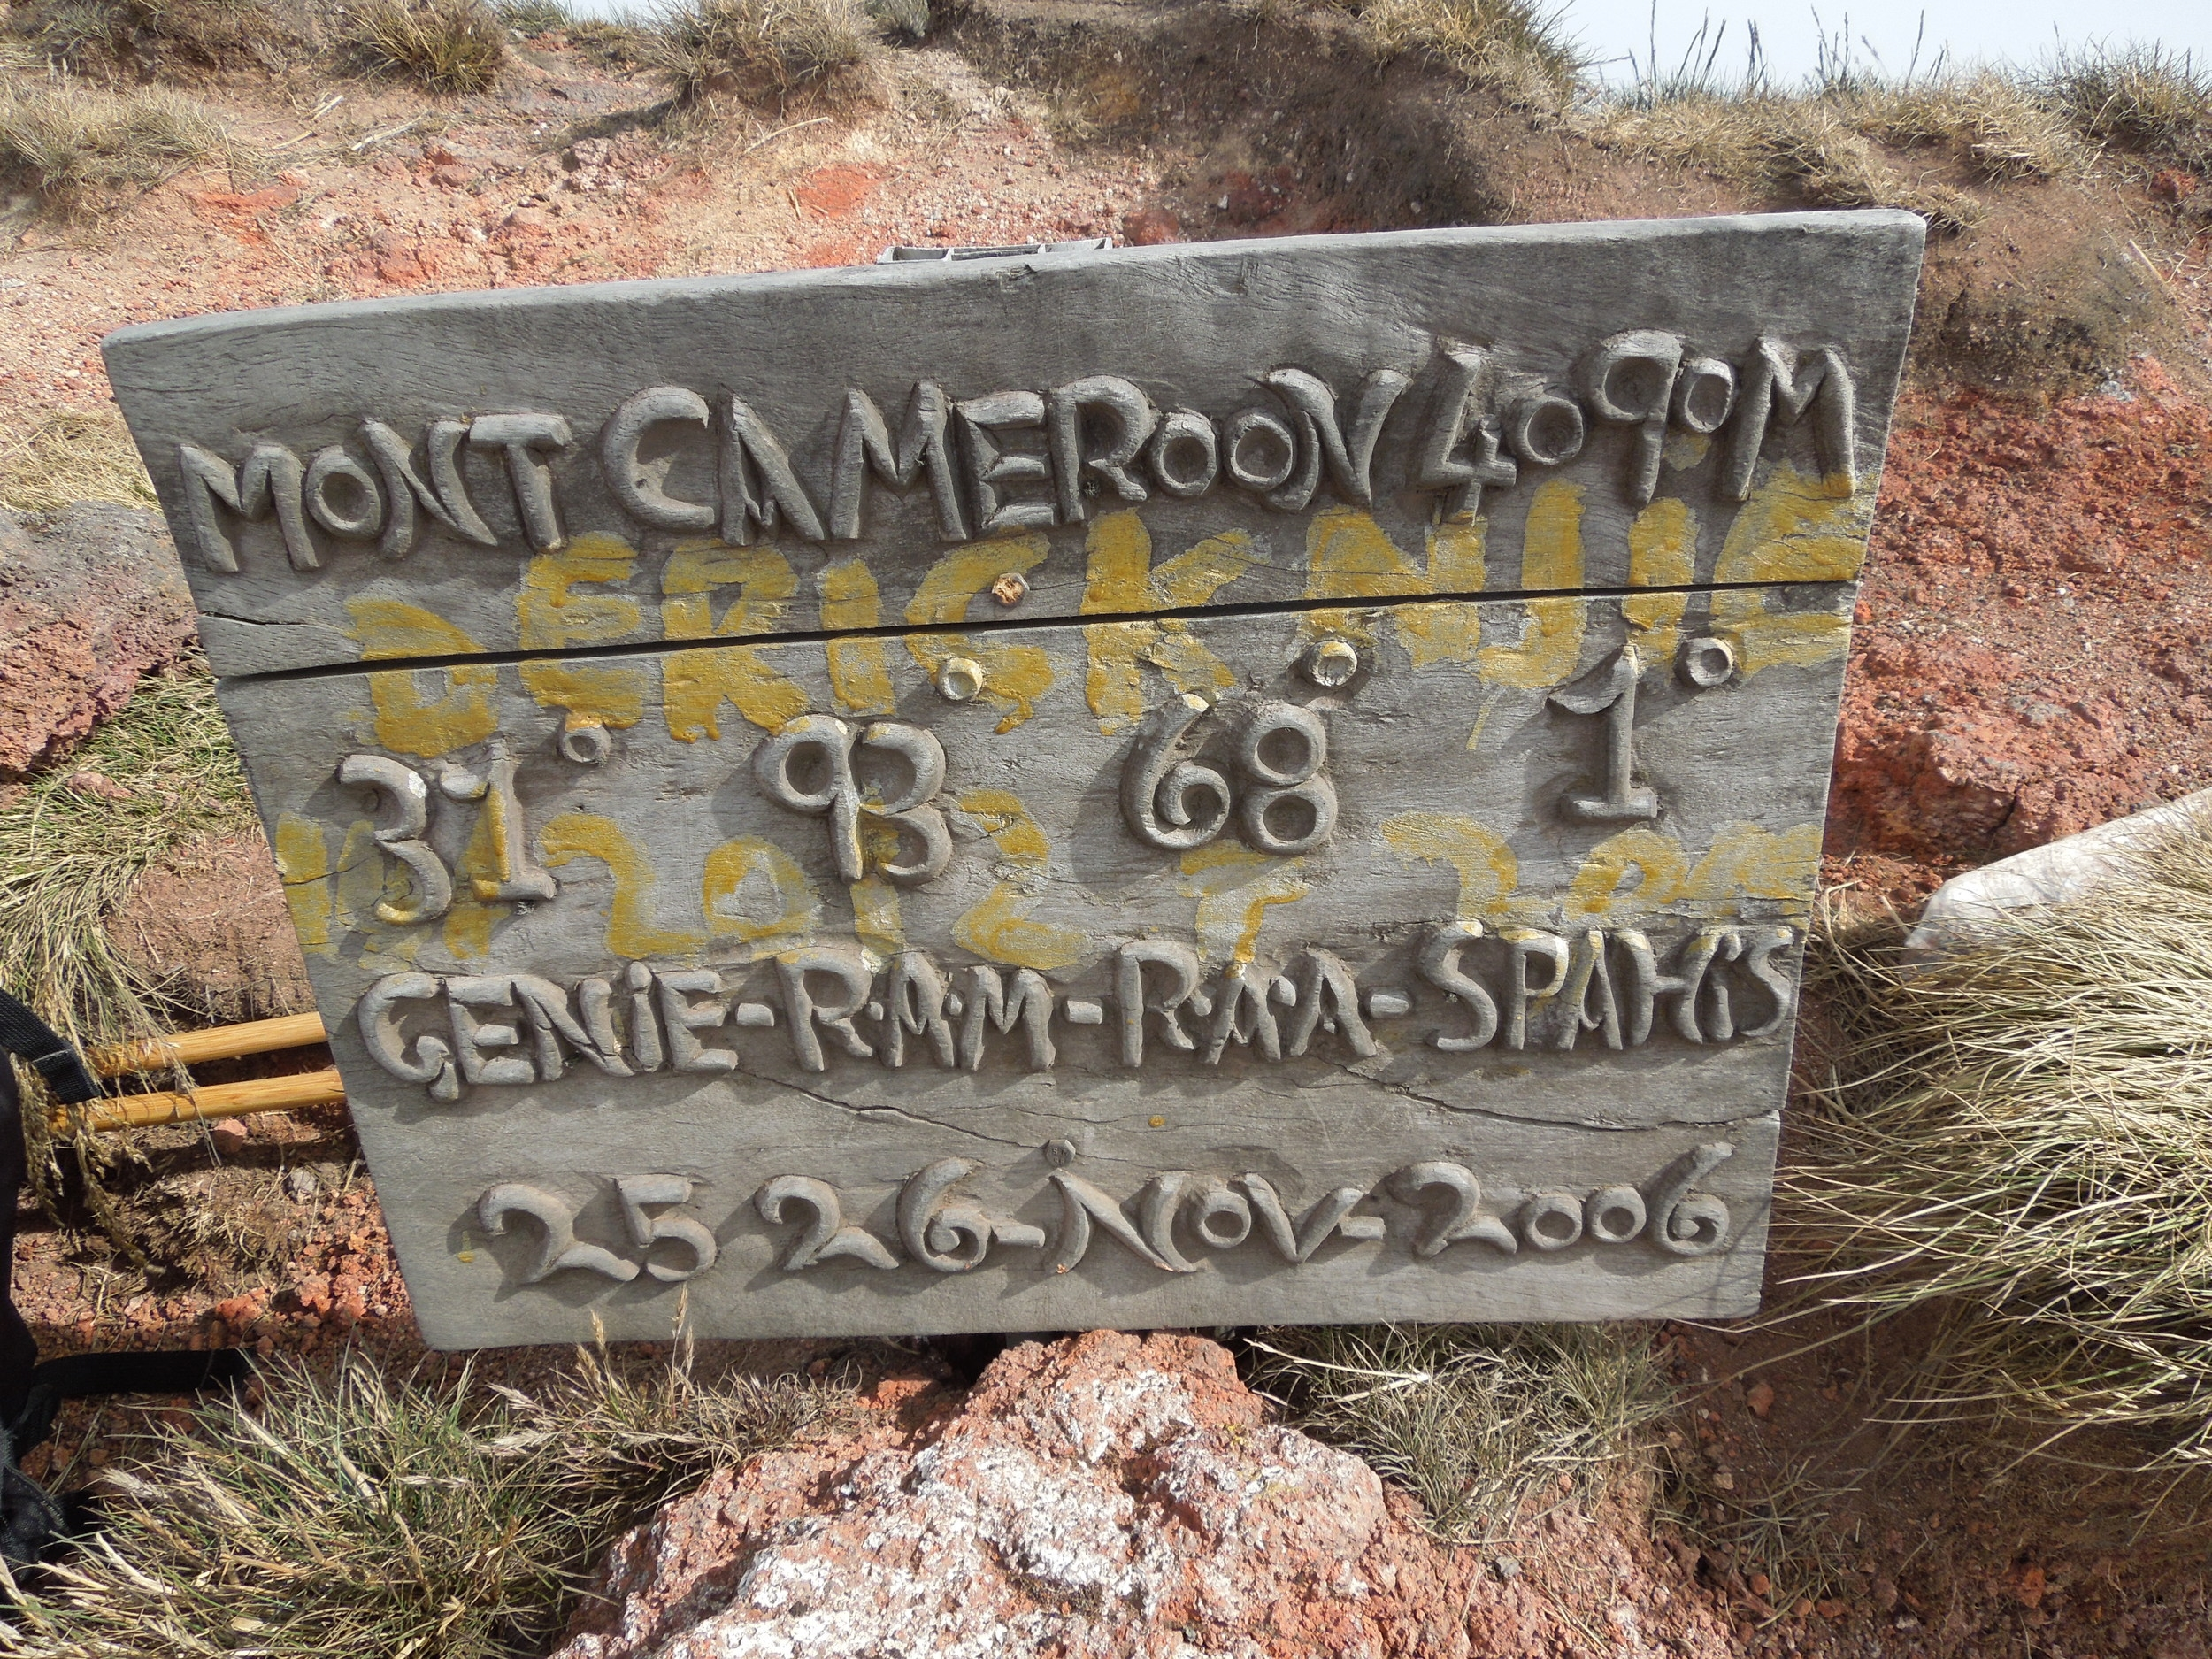 Mount Cameroon Hiki  ng Tours